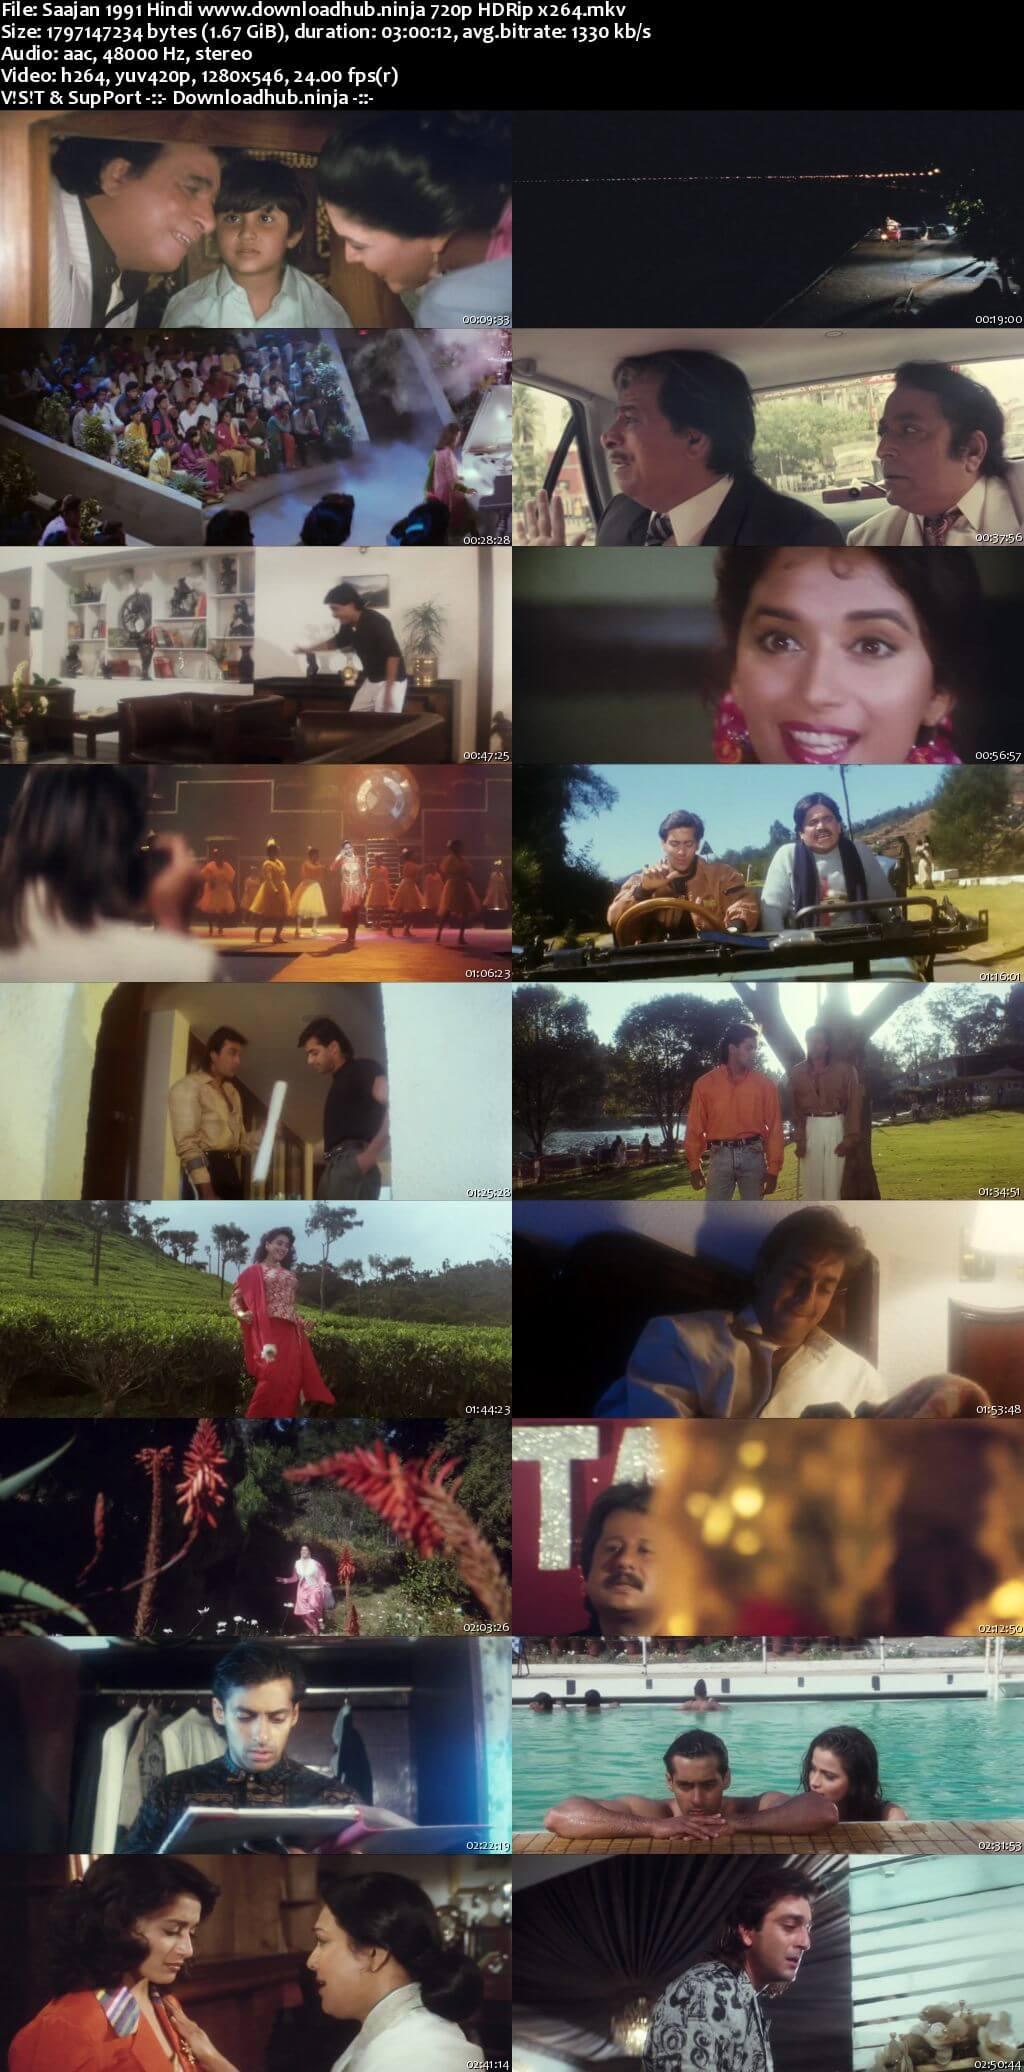 Saajan 1991 Hindi 720p HDRip x264